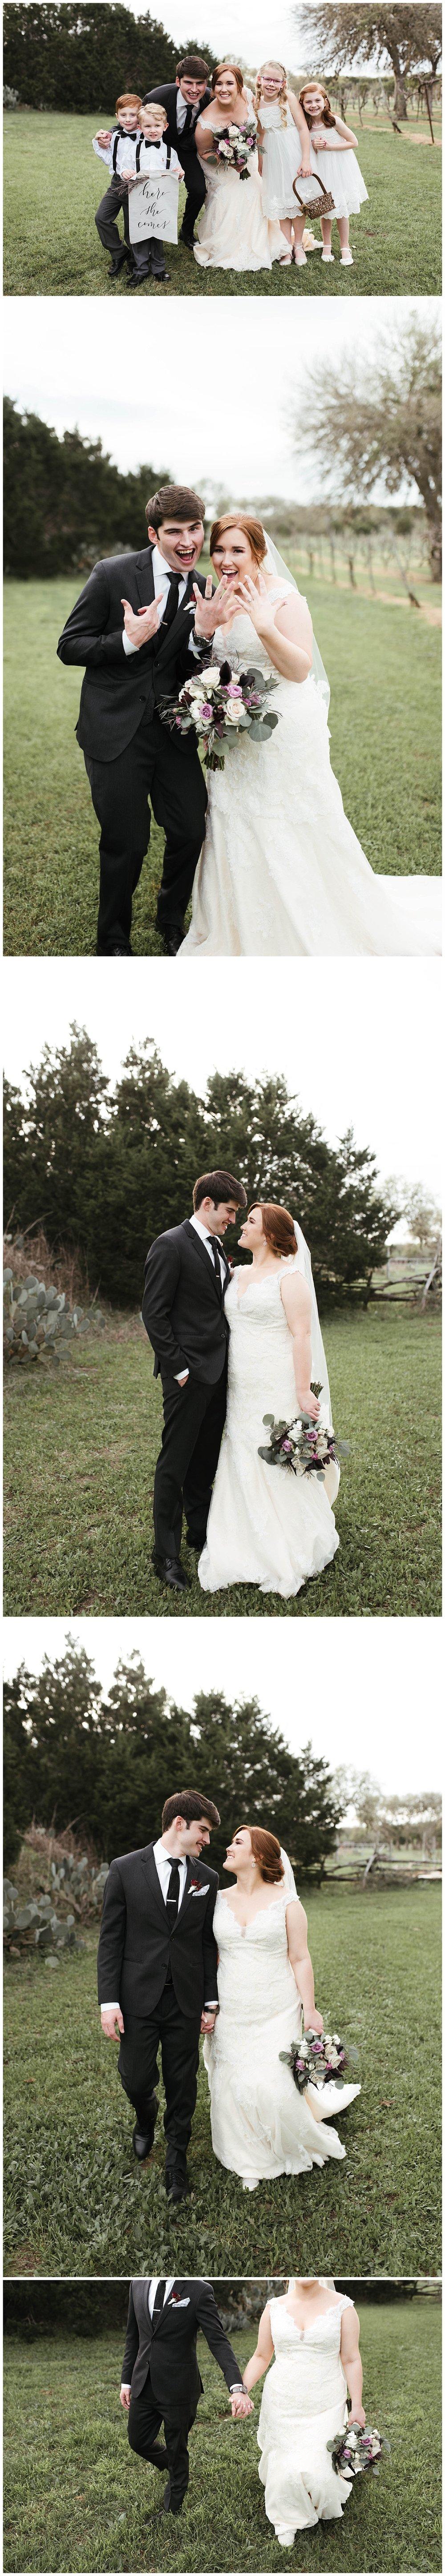 Oak Valley Vineyards Wedding, New Braunfels Wedding | Fort Worth Wedding Photographer |www.jordanmitchellphotography.com